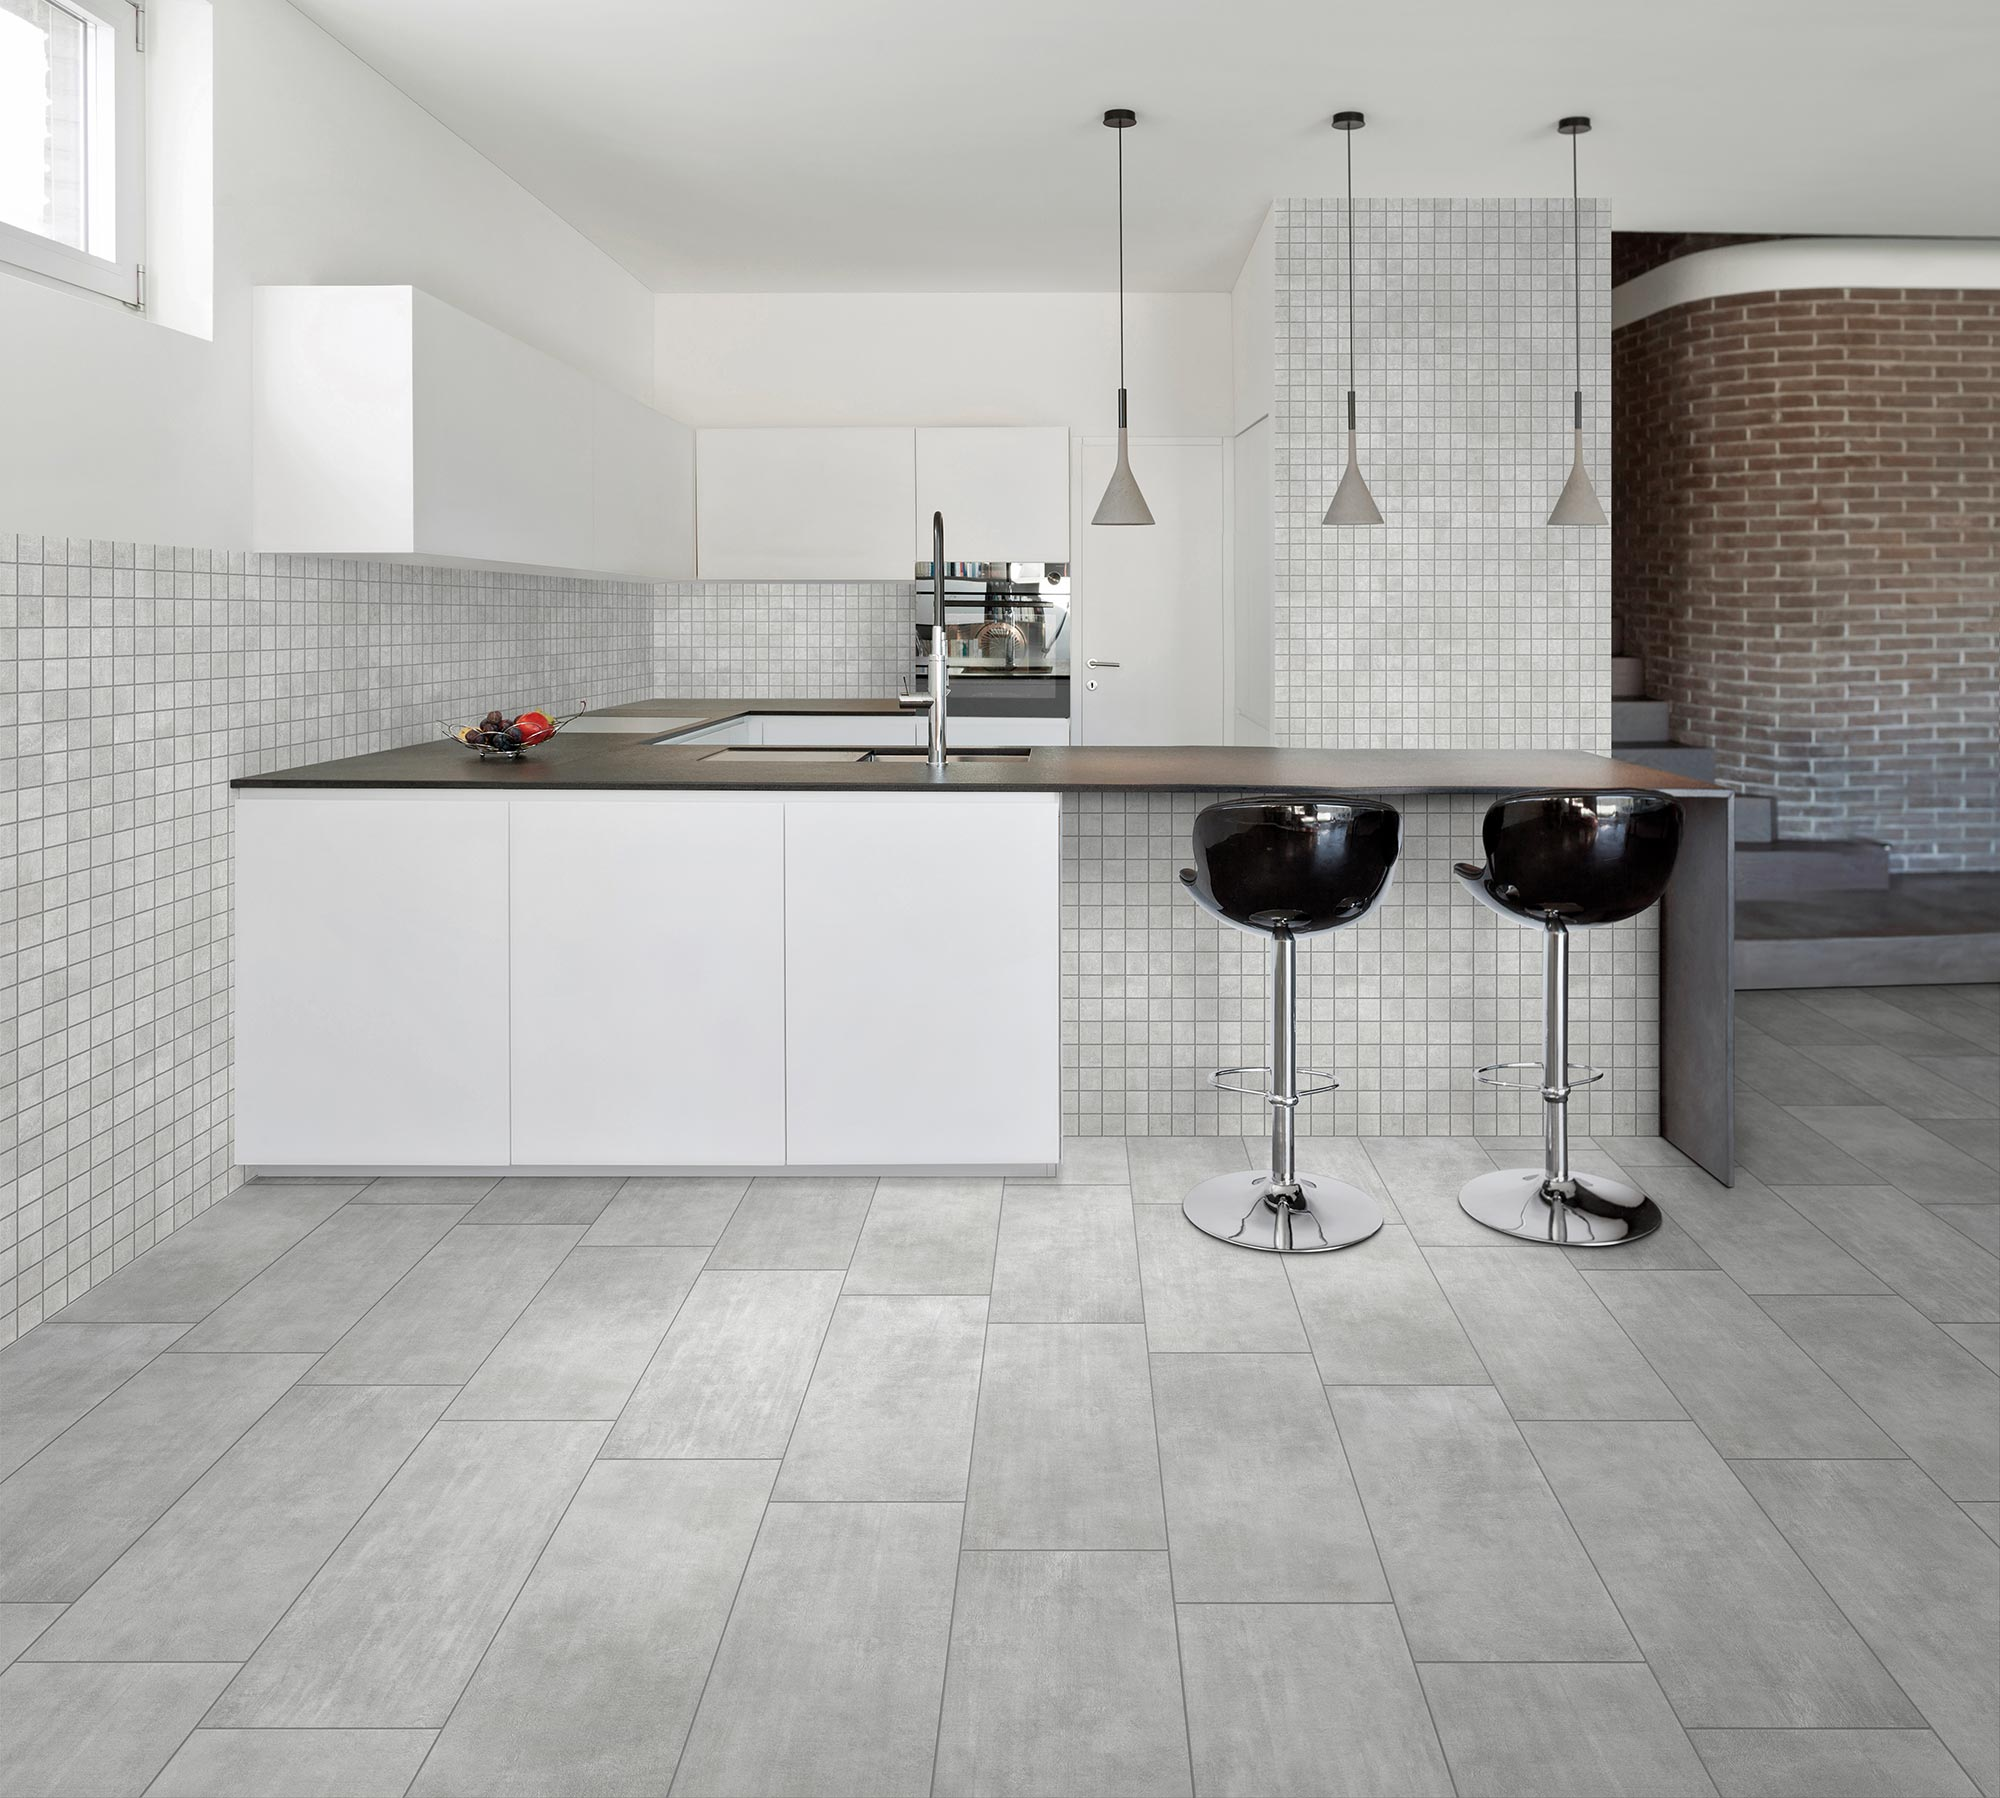 New Concrete Grau Feinsteinzeug 30x60cm Bodenfliesen Wandfliesen